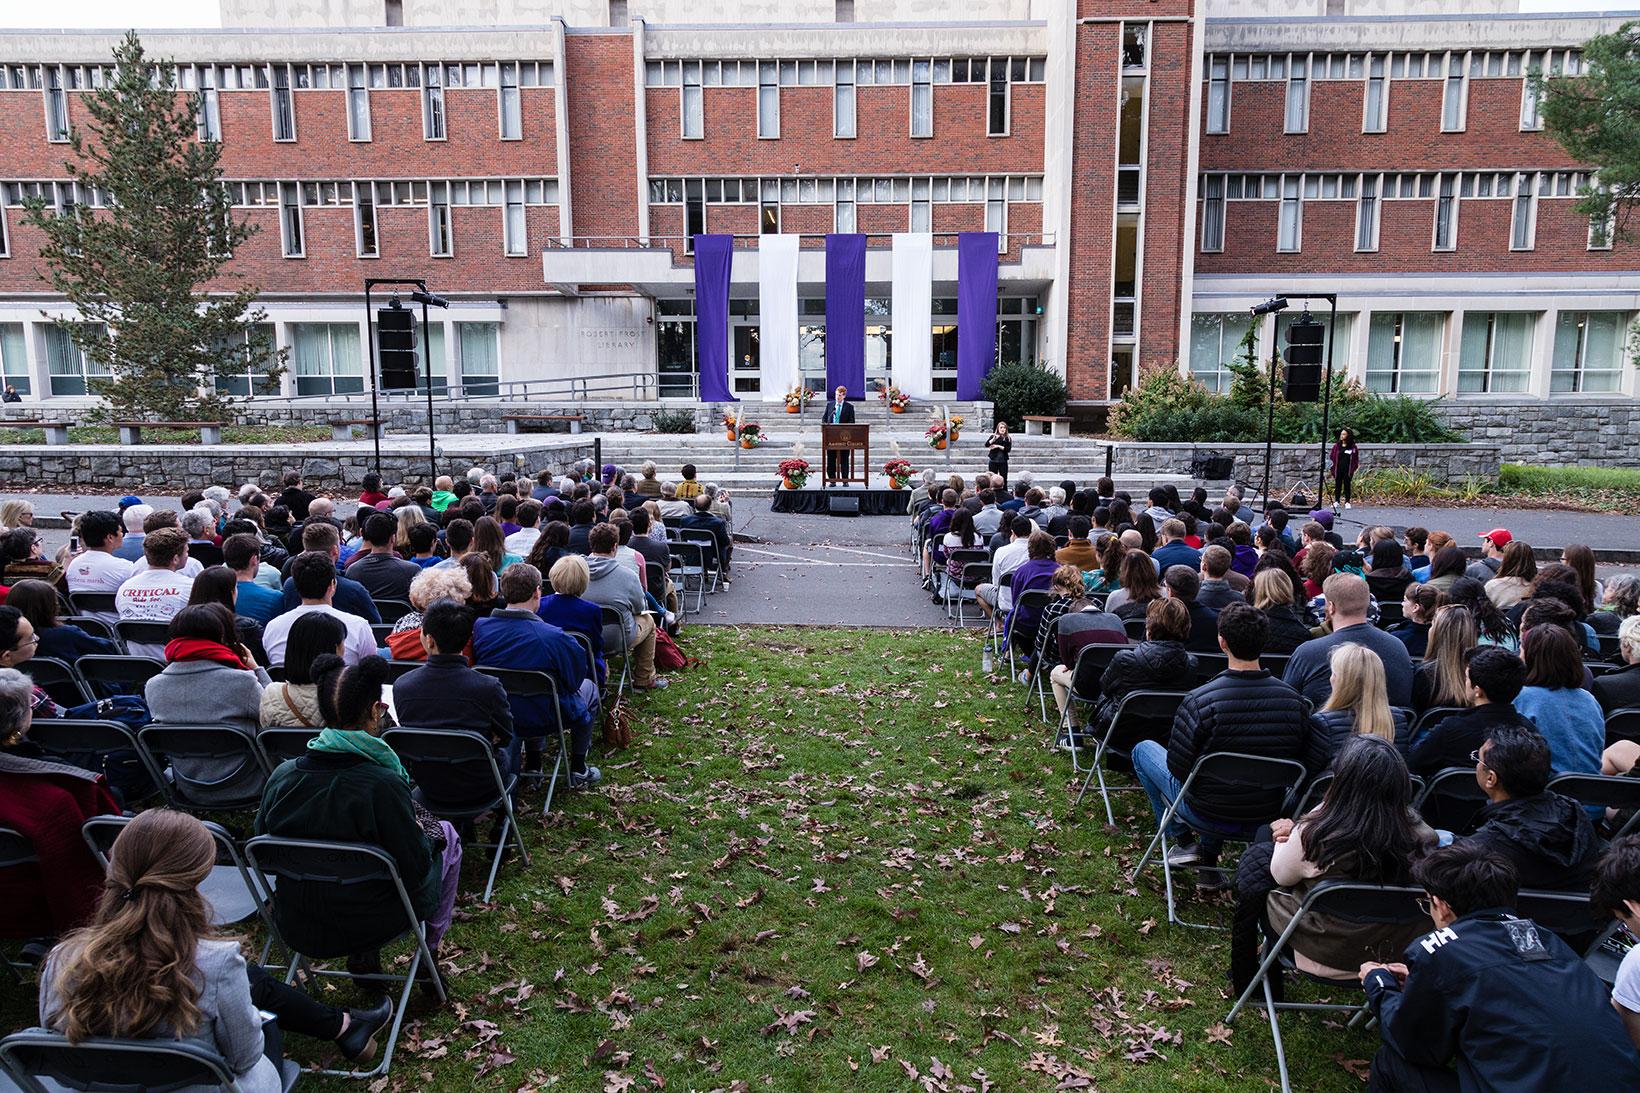 U.S. Rep. Joseph Kennedy III speaking at Amherst College Oct. 29, 2017